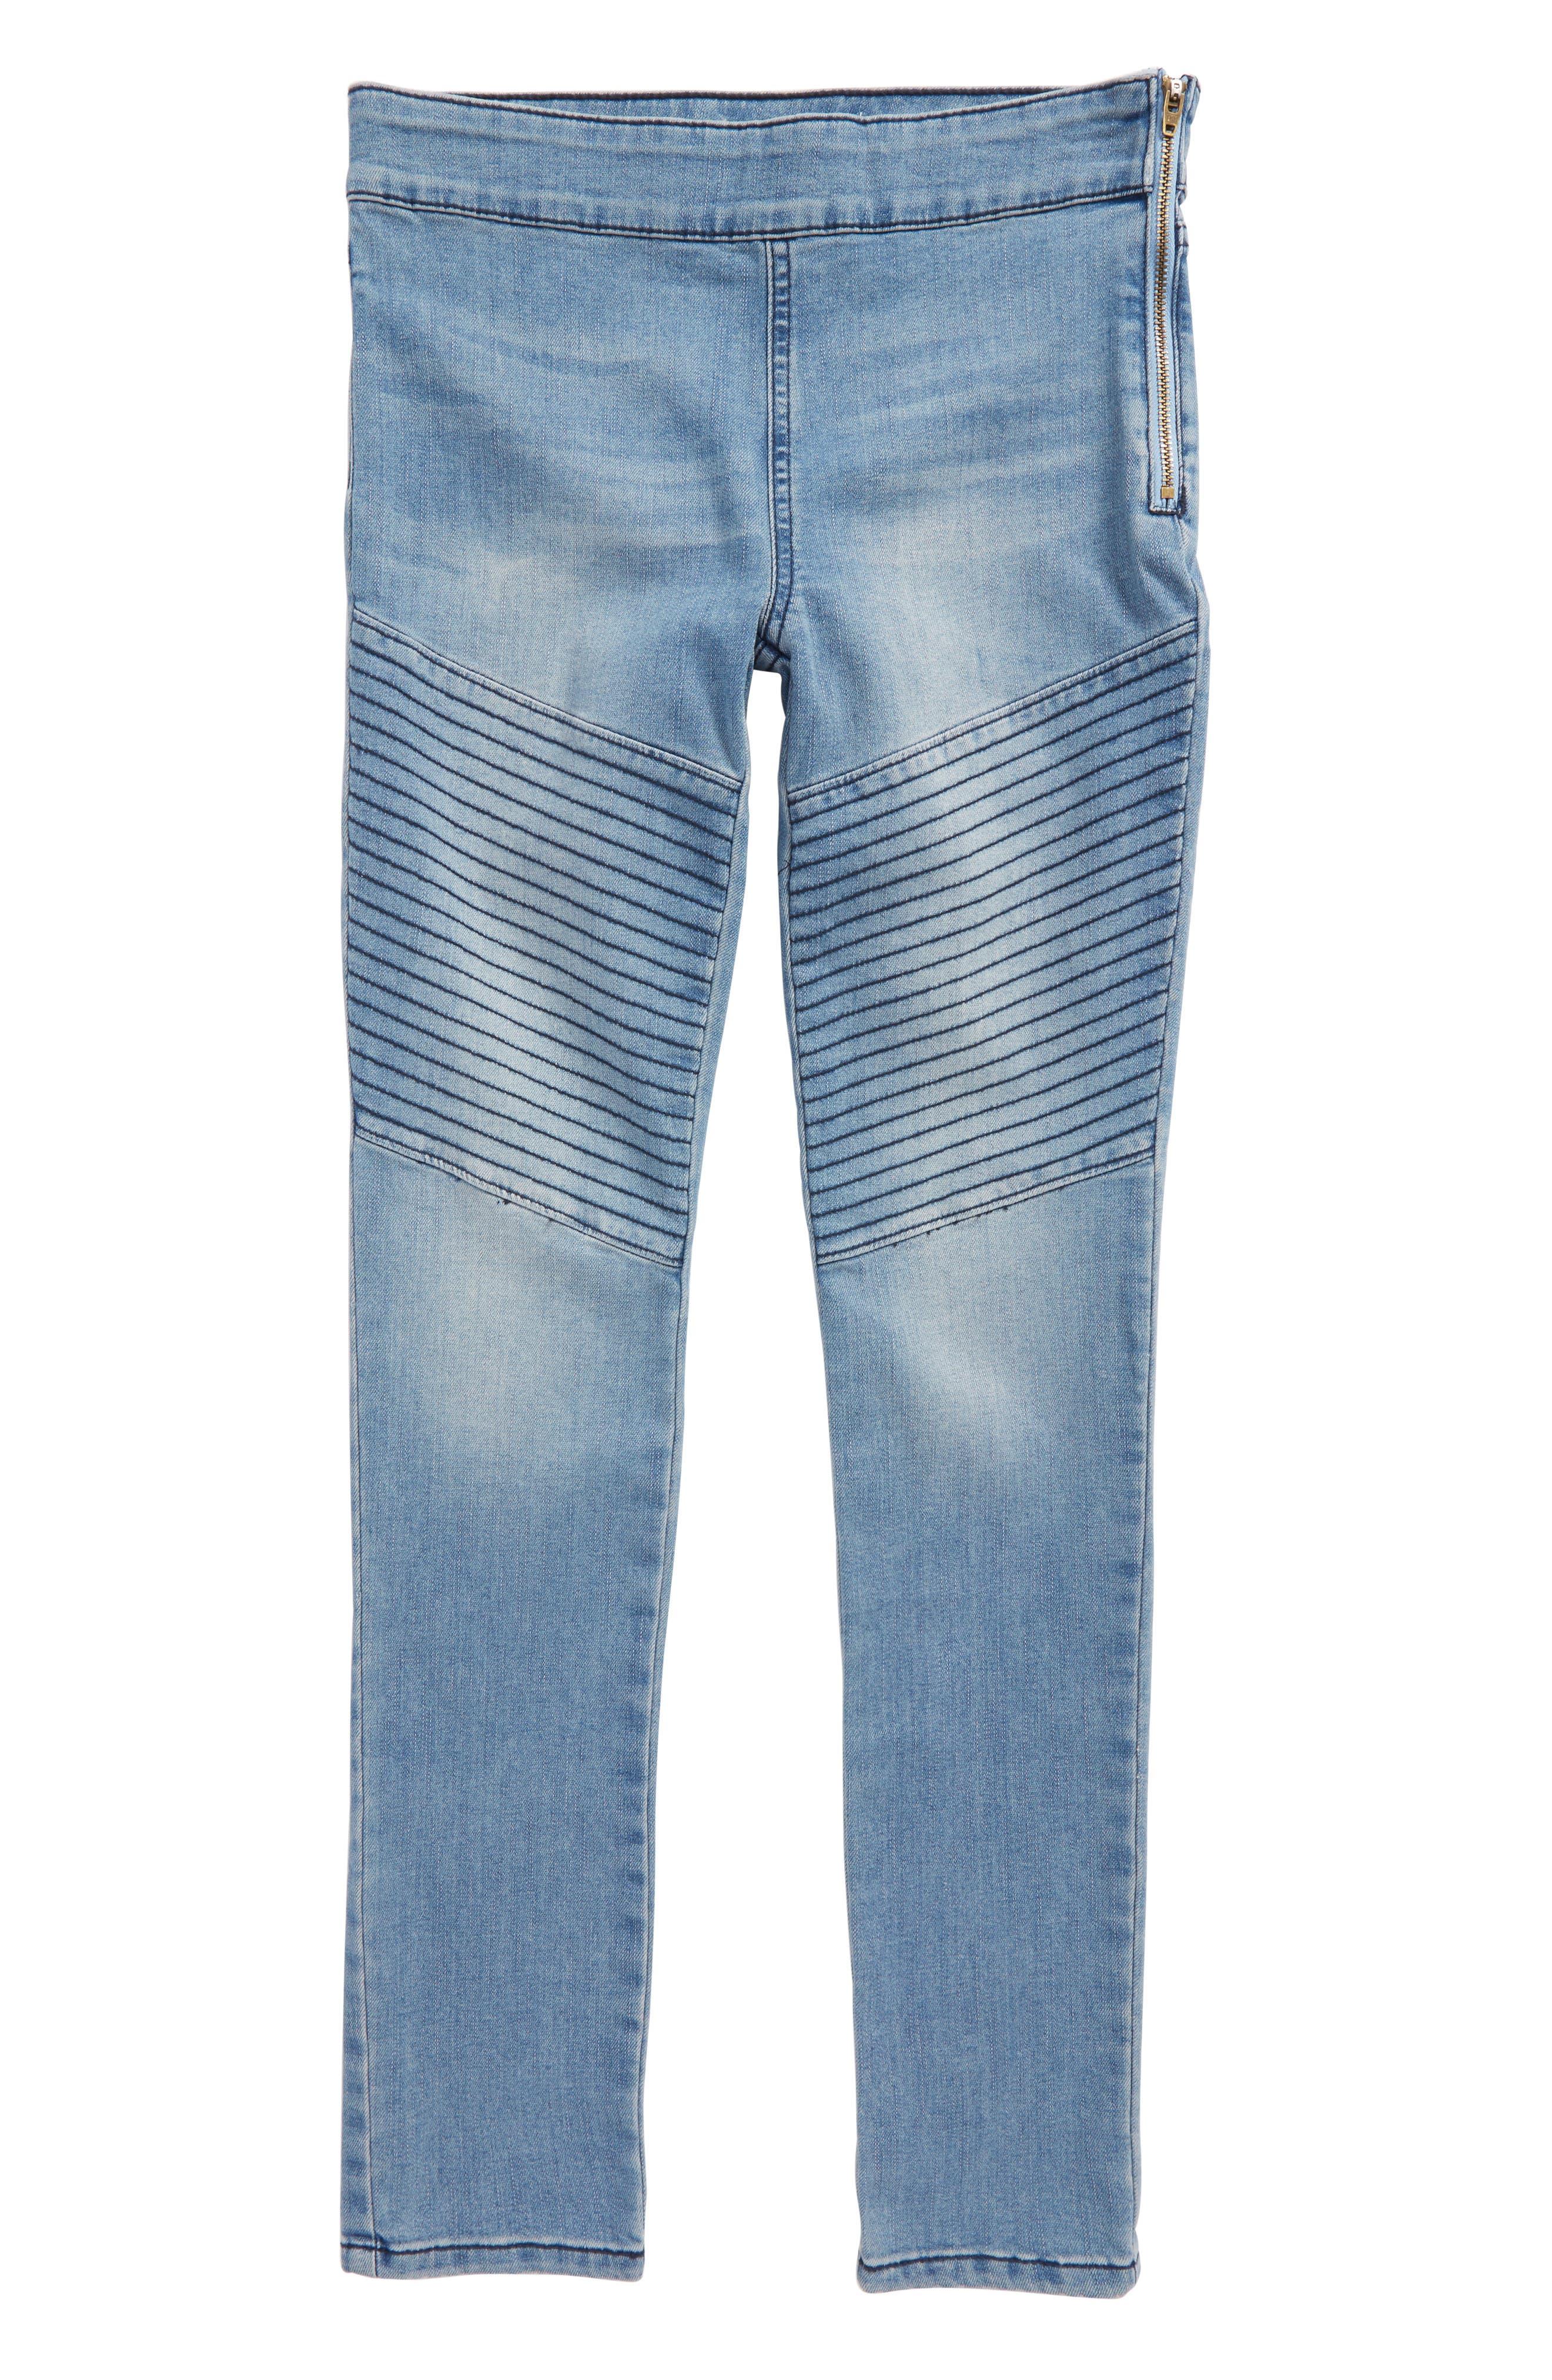 Denim Moto Leggings,                             Main thumbnail 1, color,                             Blue Bird Wash